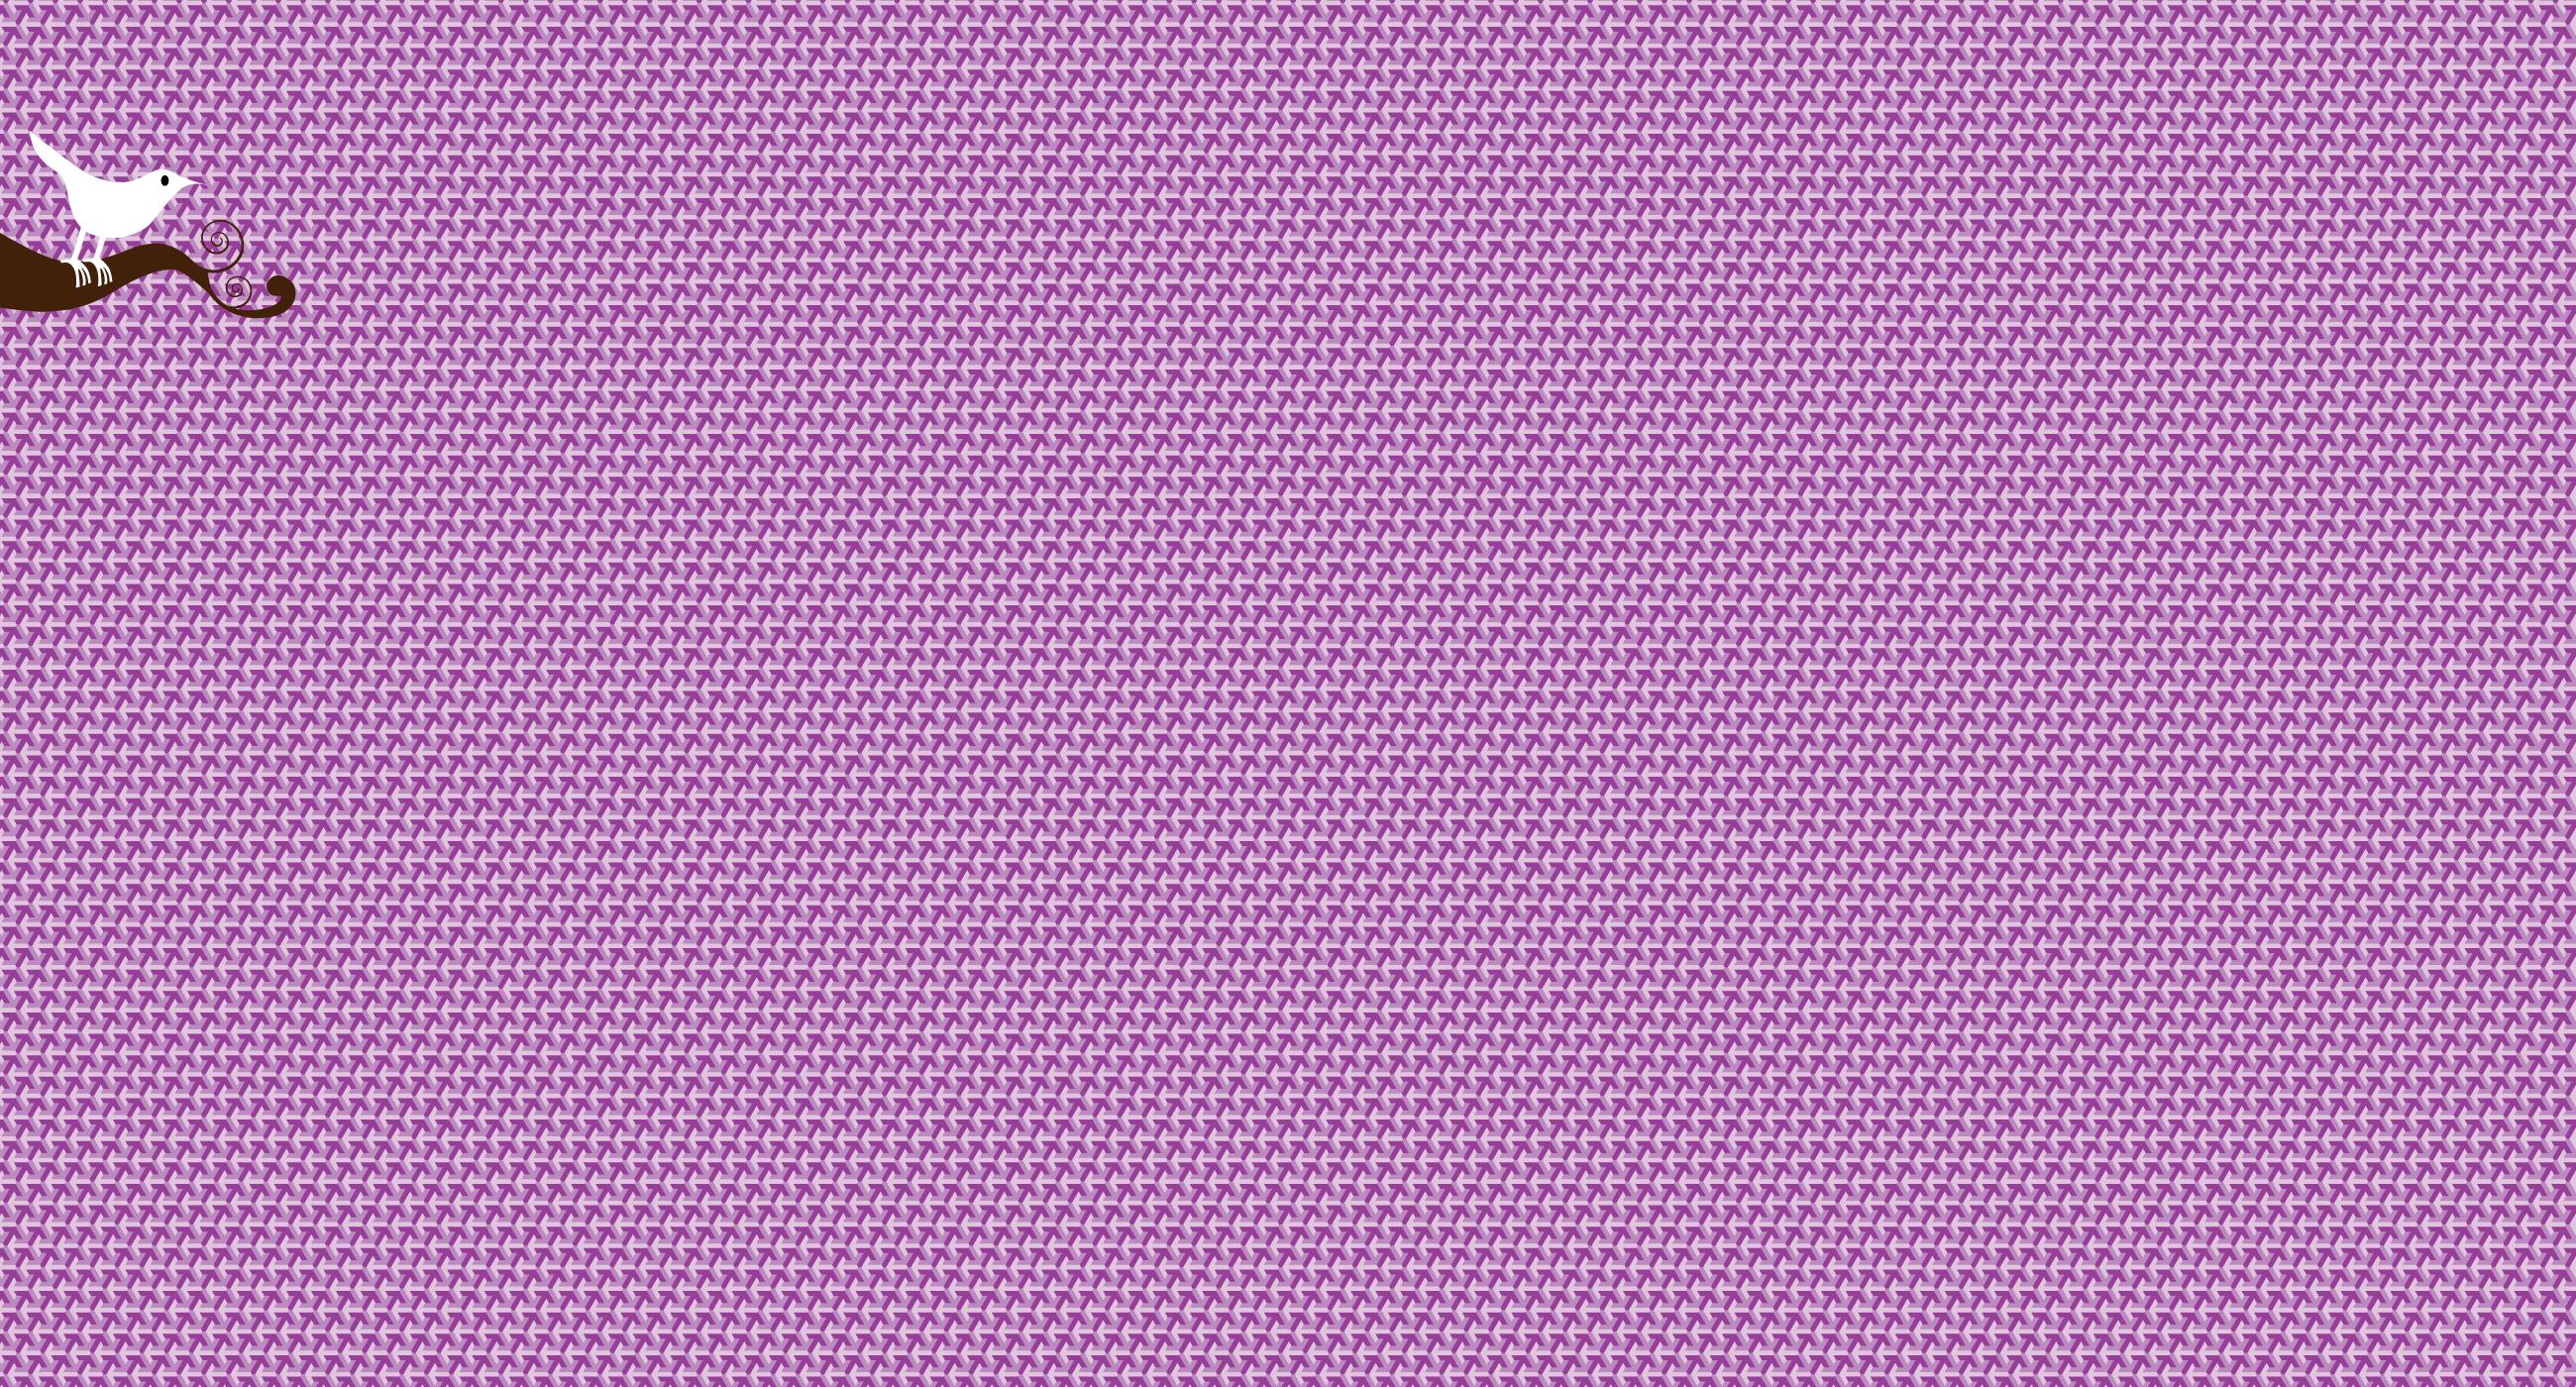 Purple Twitter Backgrounds 2600x1400